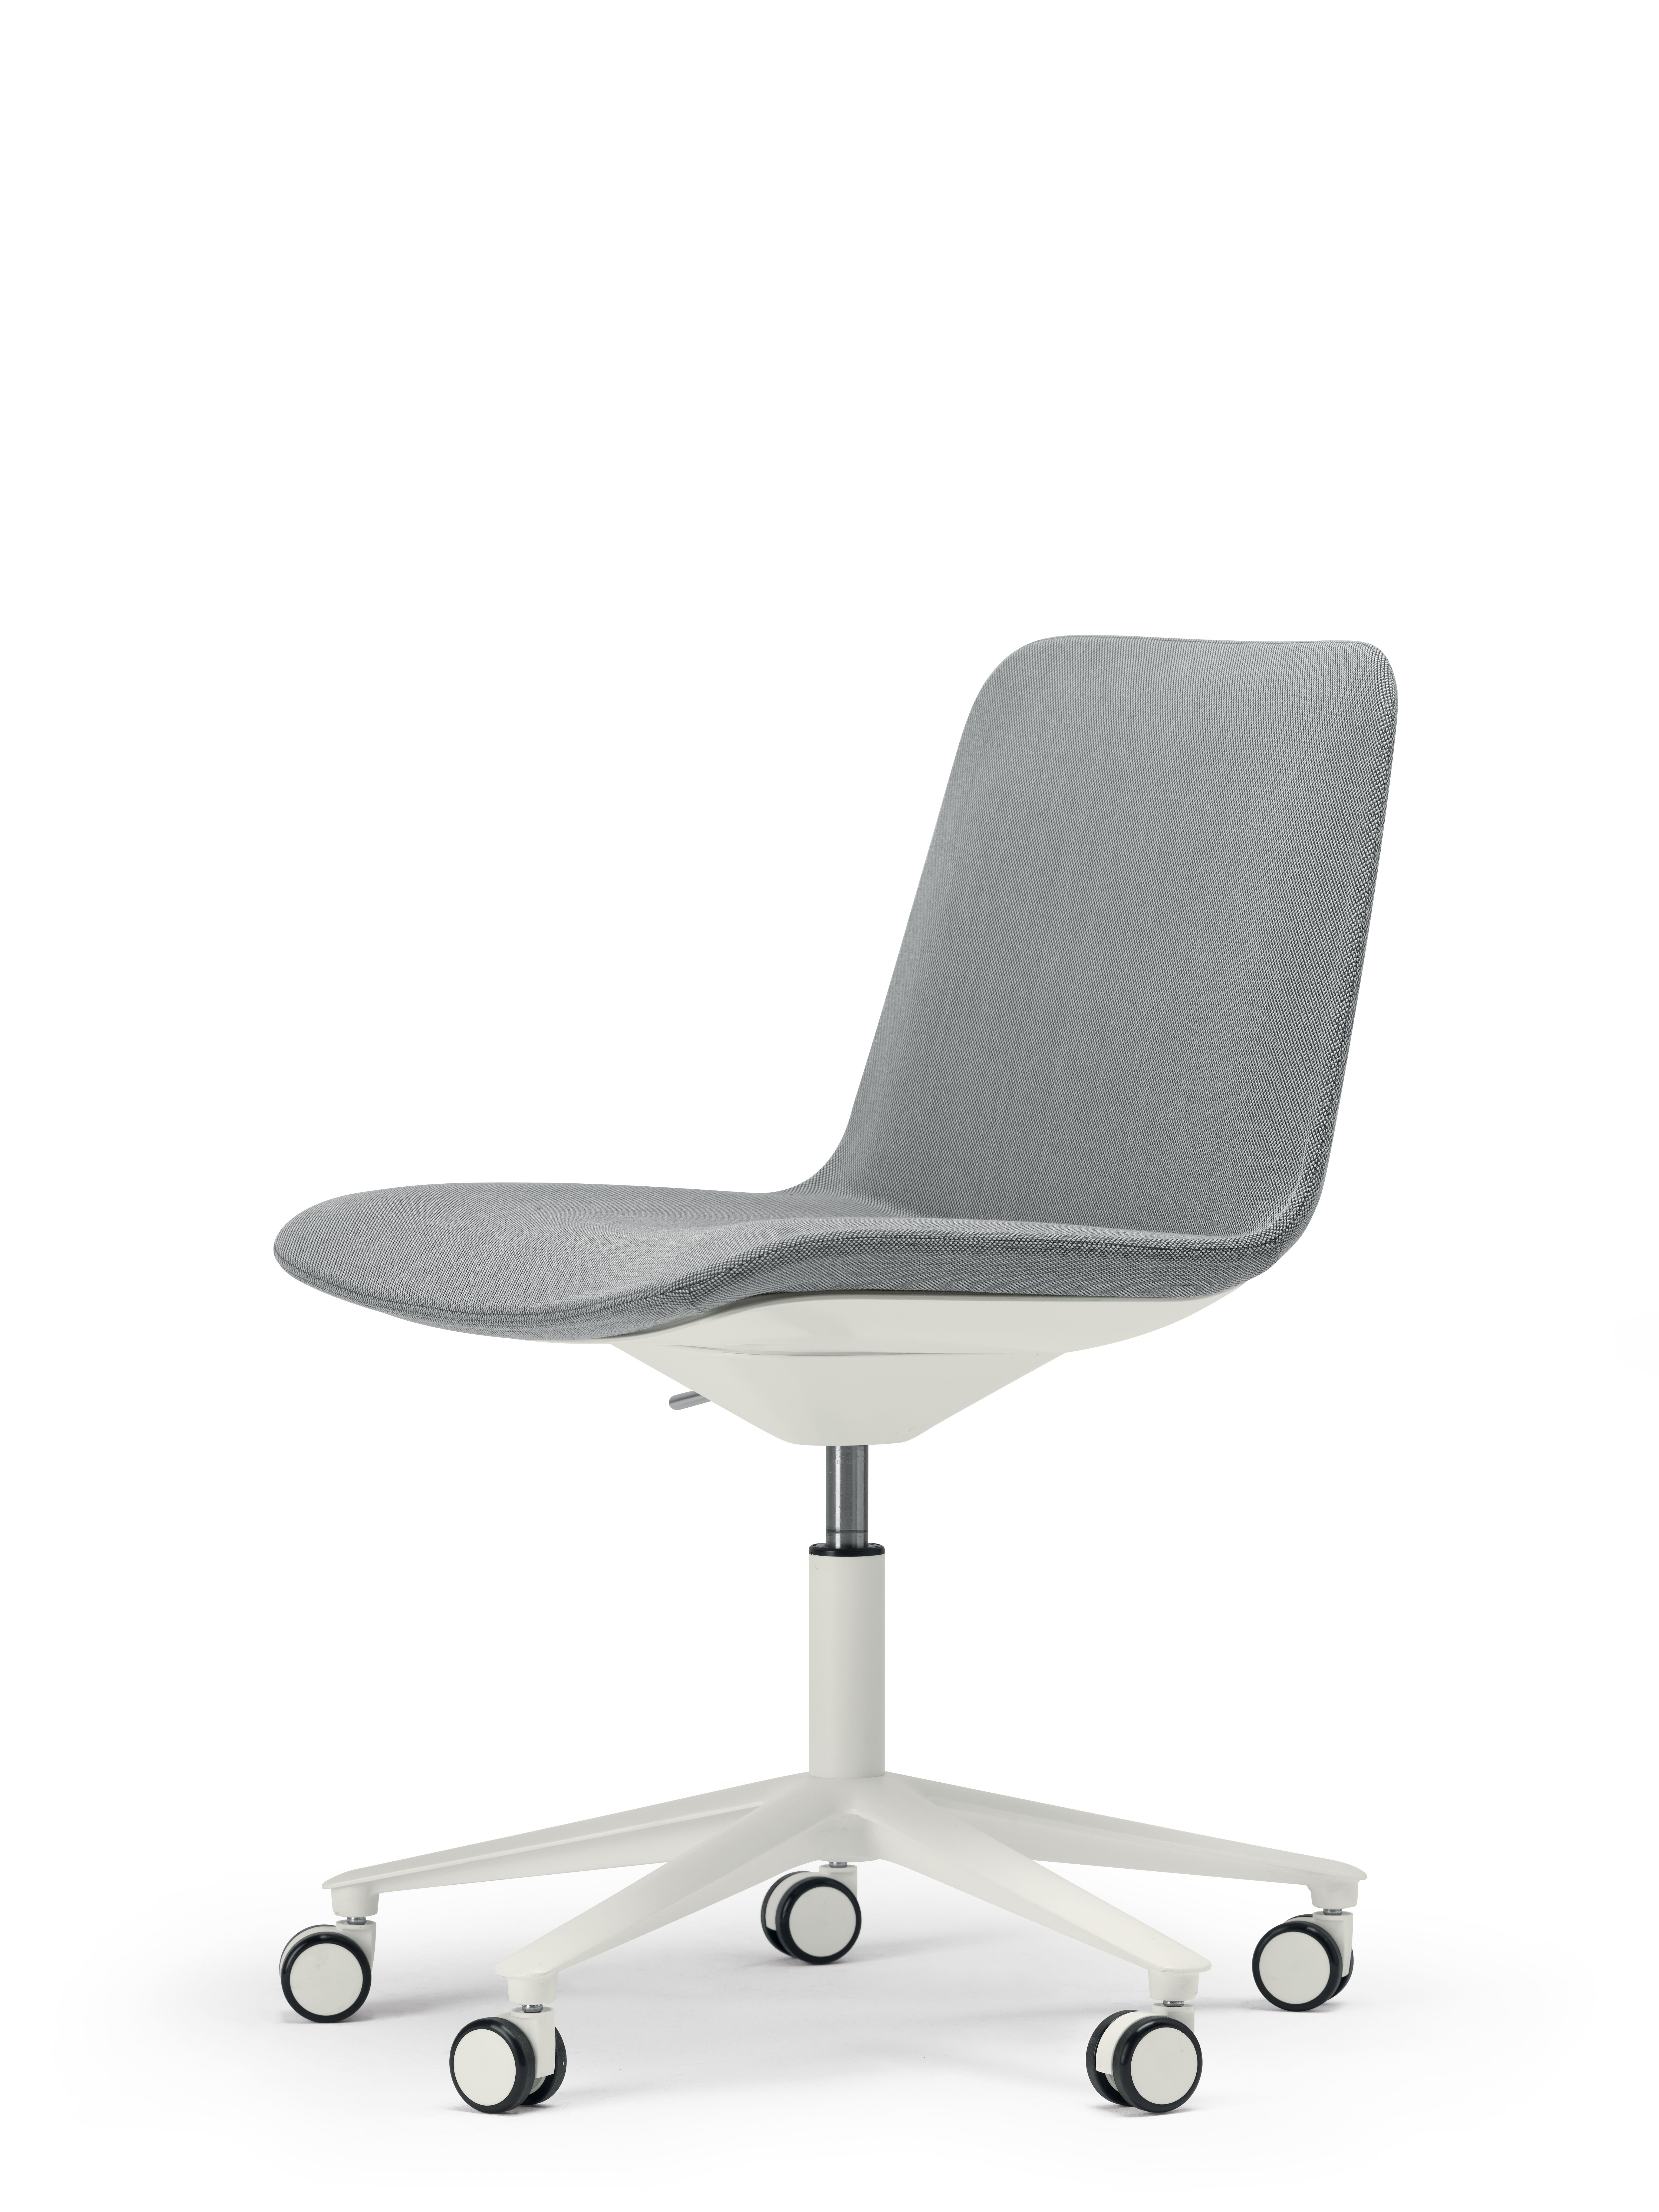 Slim Desinged By Pearsonlloyd For Alias 家具デザイン 椅子 デザイン